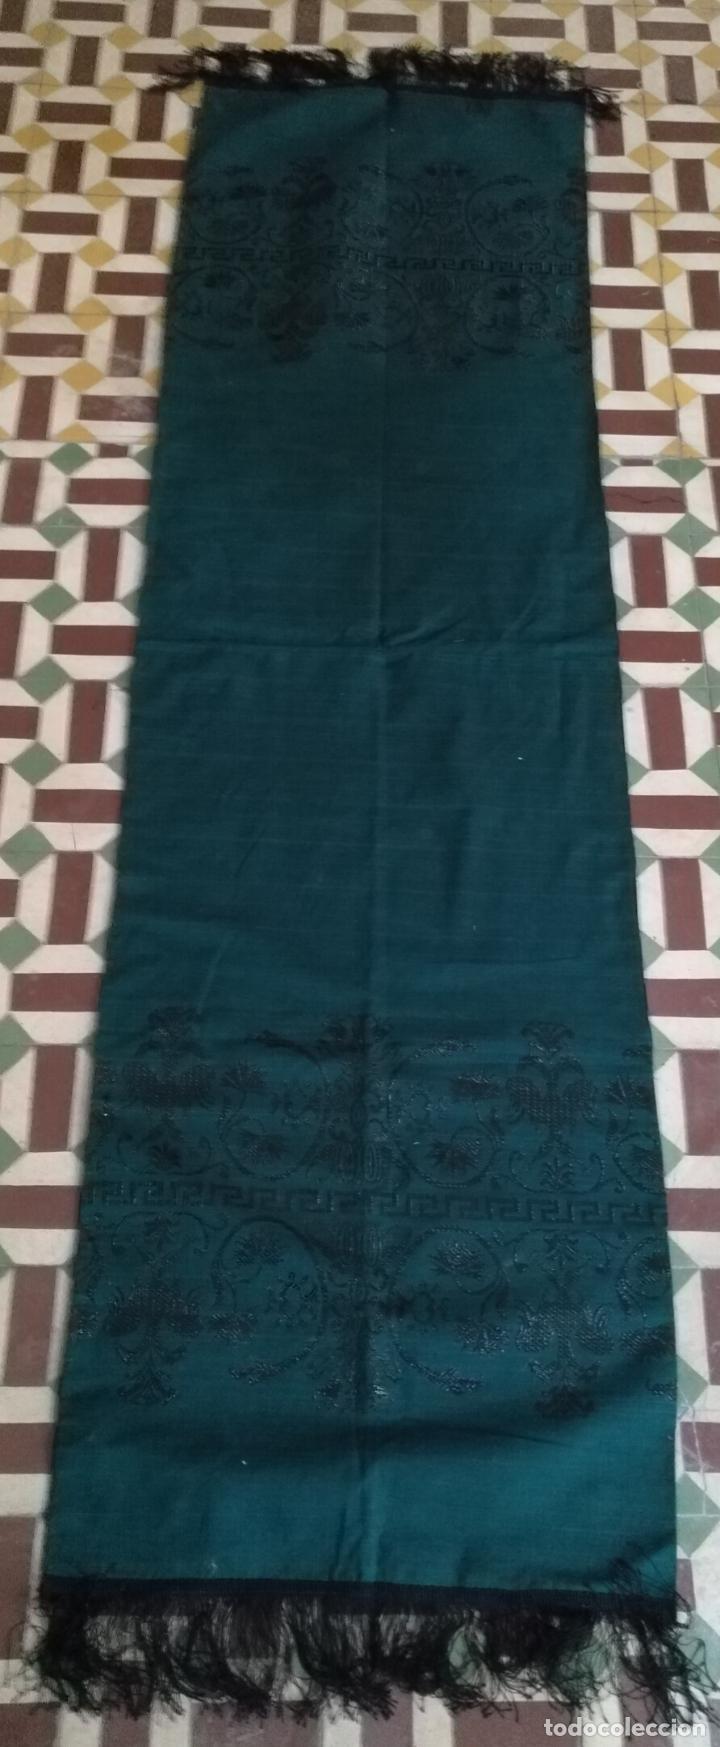 Antigüedades: Estola pañolon manton traje regional brocado fallerra charra baturra fajin virgen esperanza - Foto 13 - 157742762